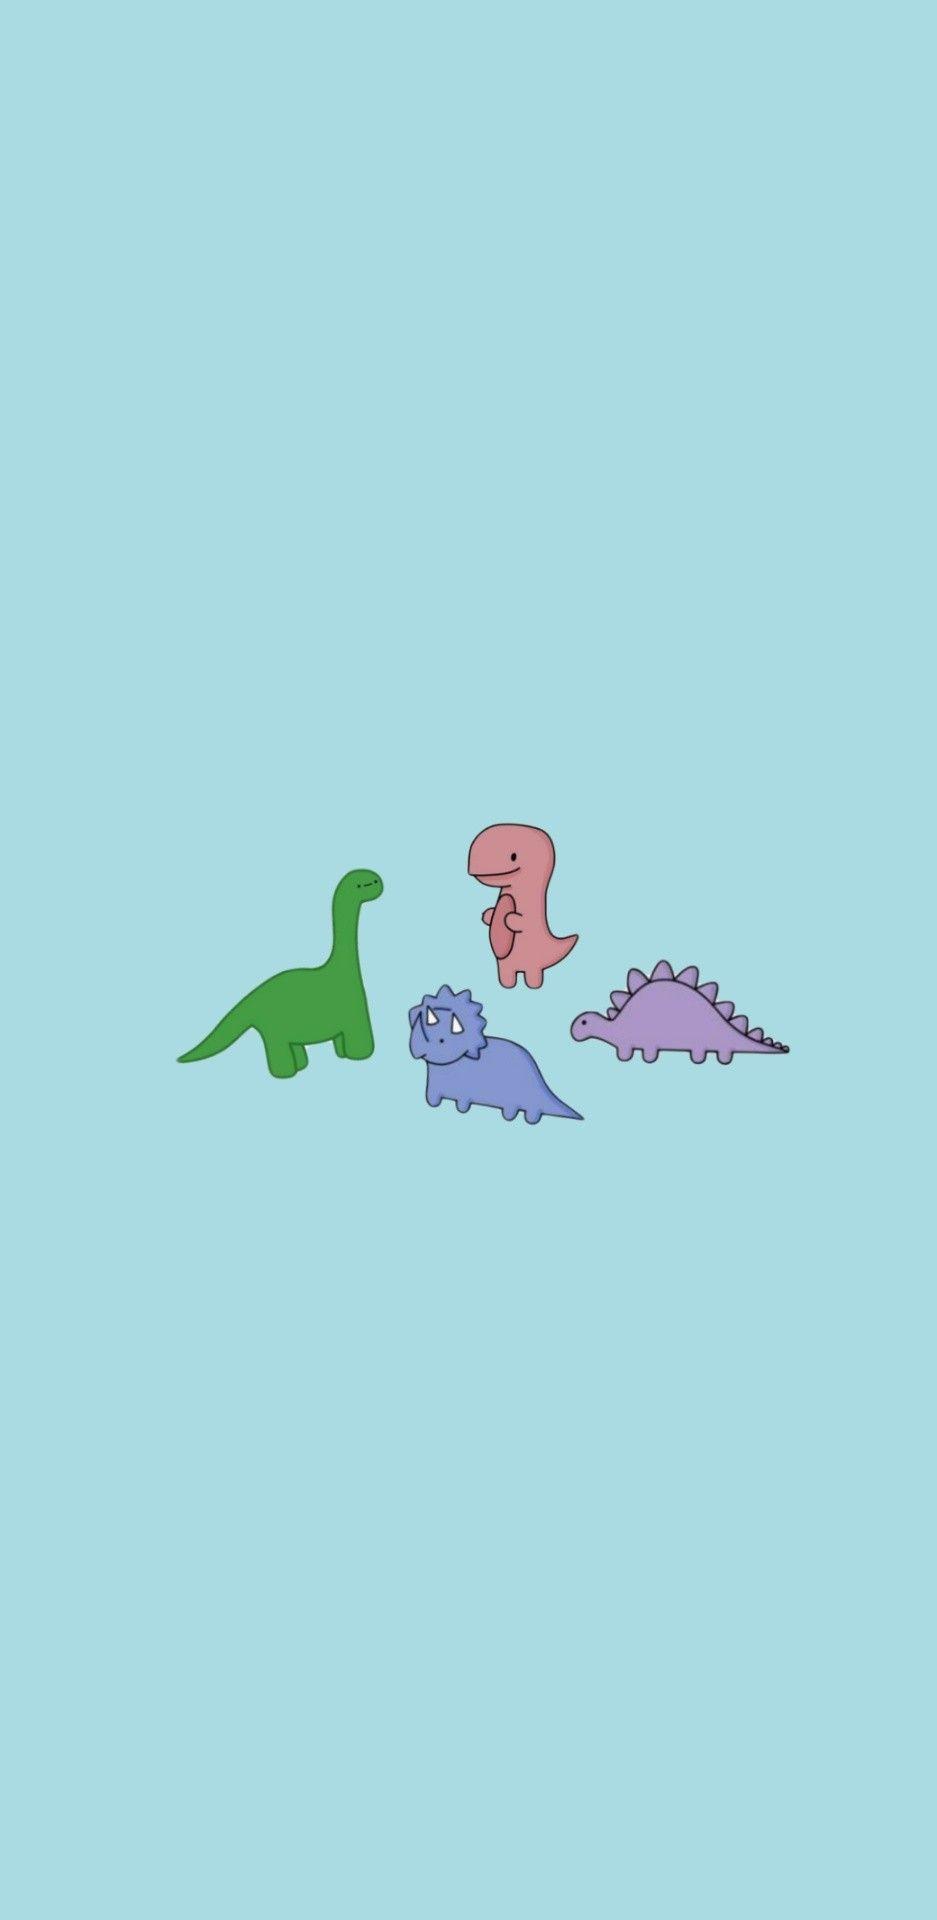 Cute Dino Wallpaper Dinosaur Wallpaper Cute Little Drawings Iphone Wallpaper Pattern